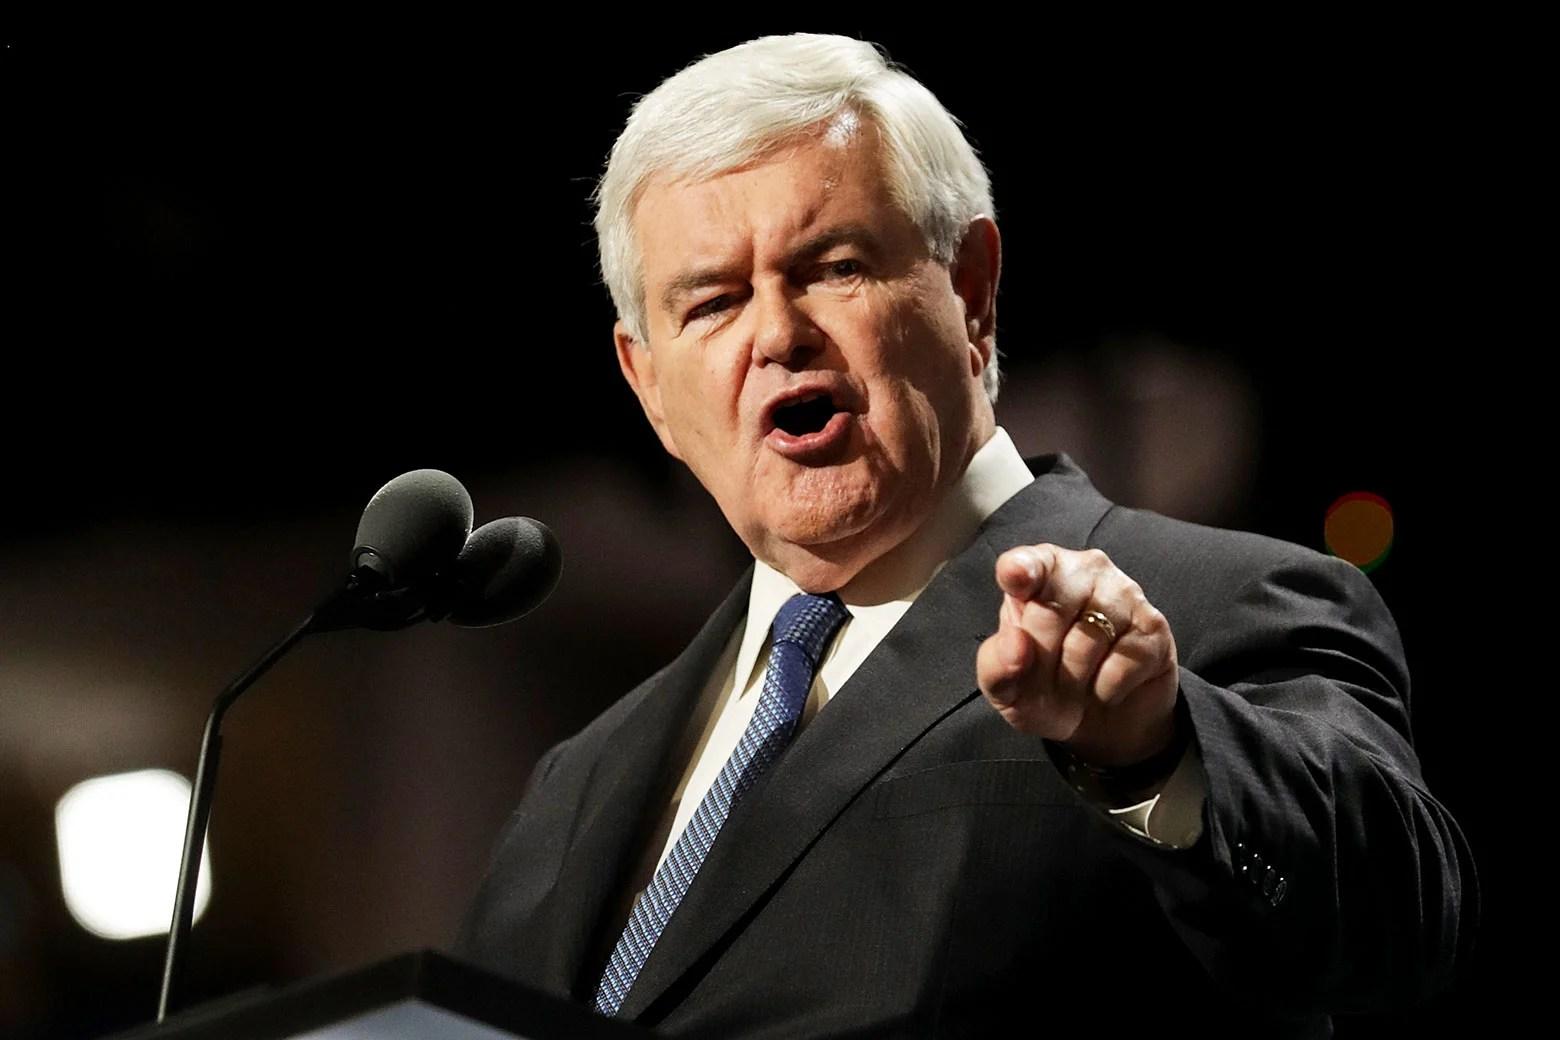 Speaker Newt Gingrich S Plane Ride President Bill Clinton